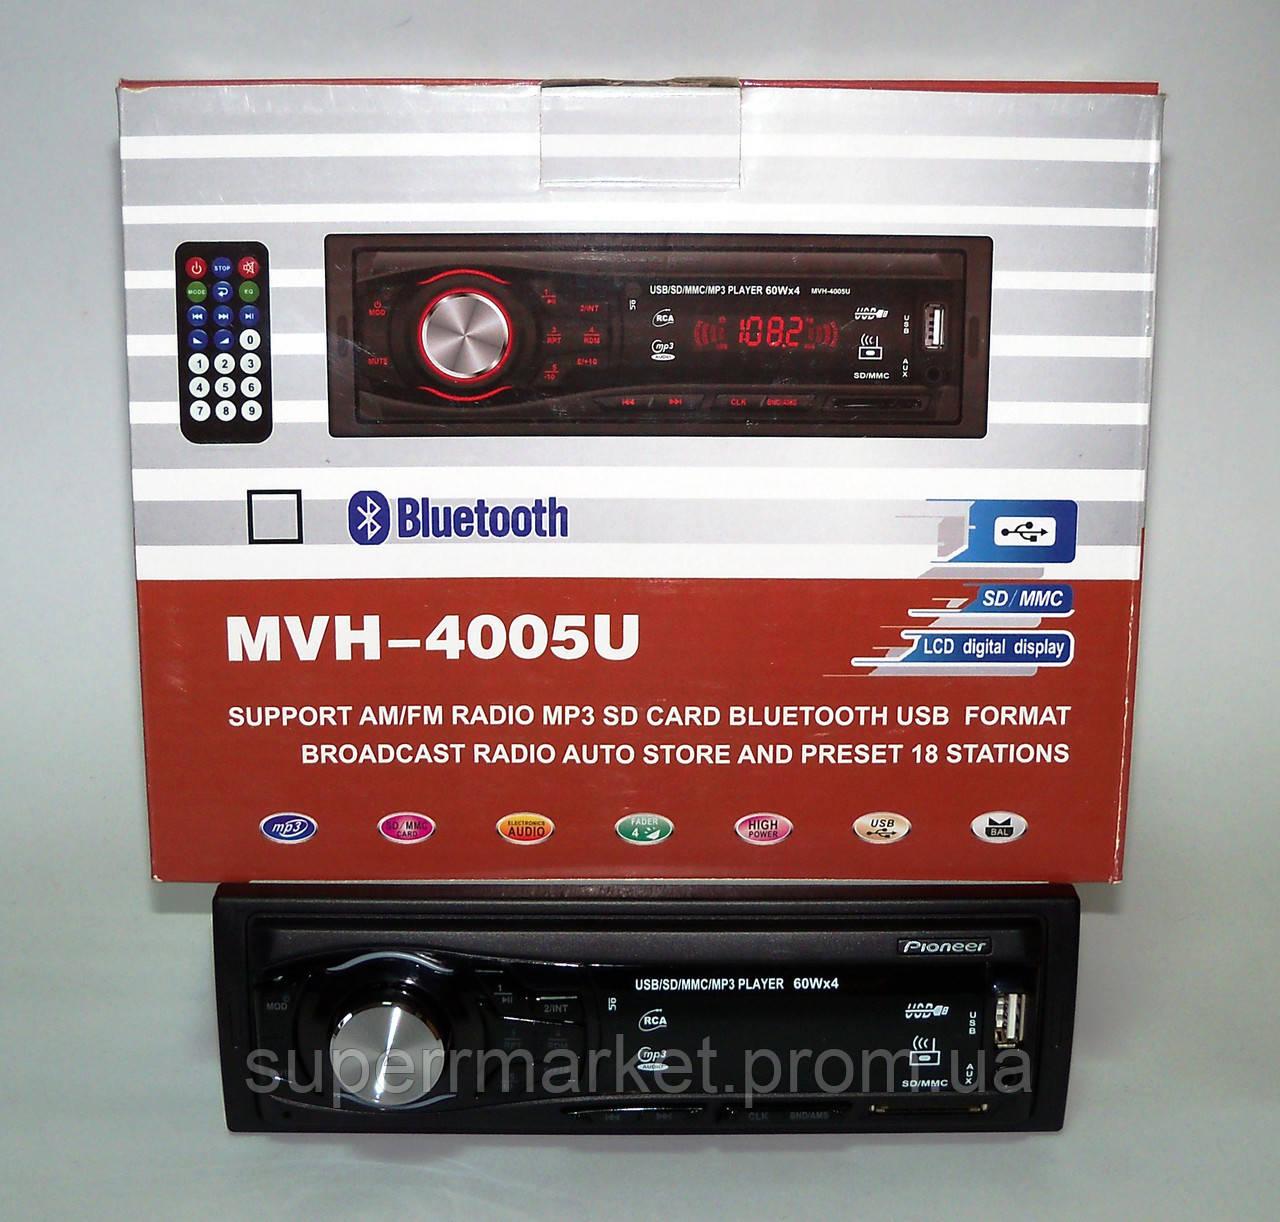 Автомагнитола Pioneer MVH-4005U 60W MP3 SD USB AUX FM